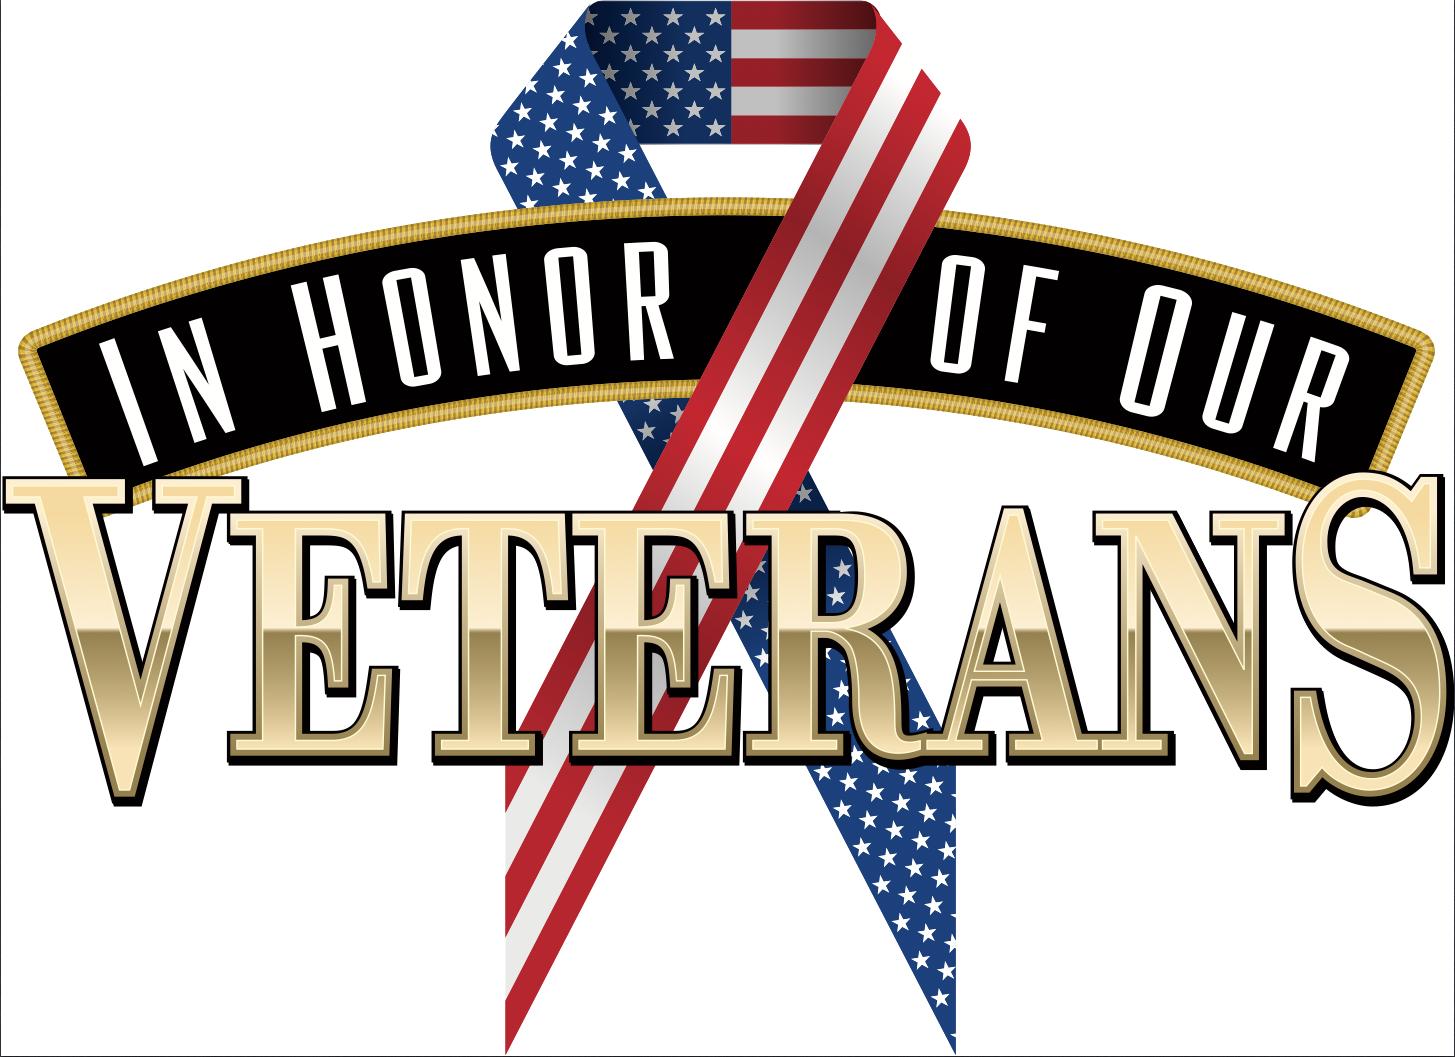 Veterans day 2015 free clipart vector transparent Veterans Day 2015 Clipart | Free download best Veterans Day ... vector transparent